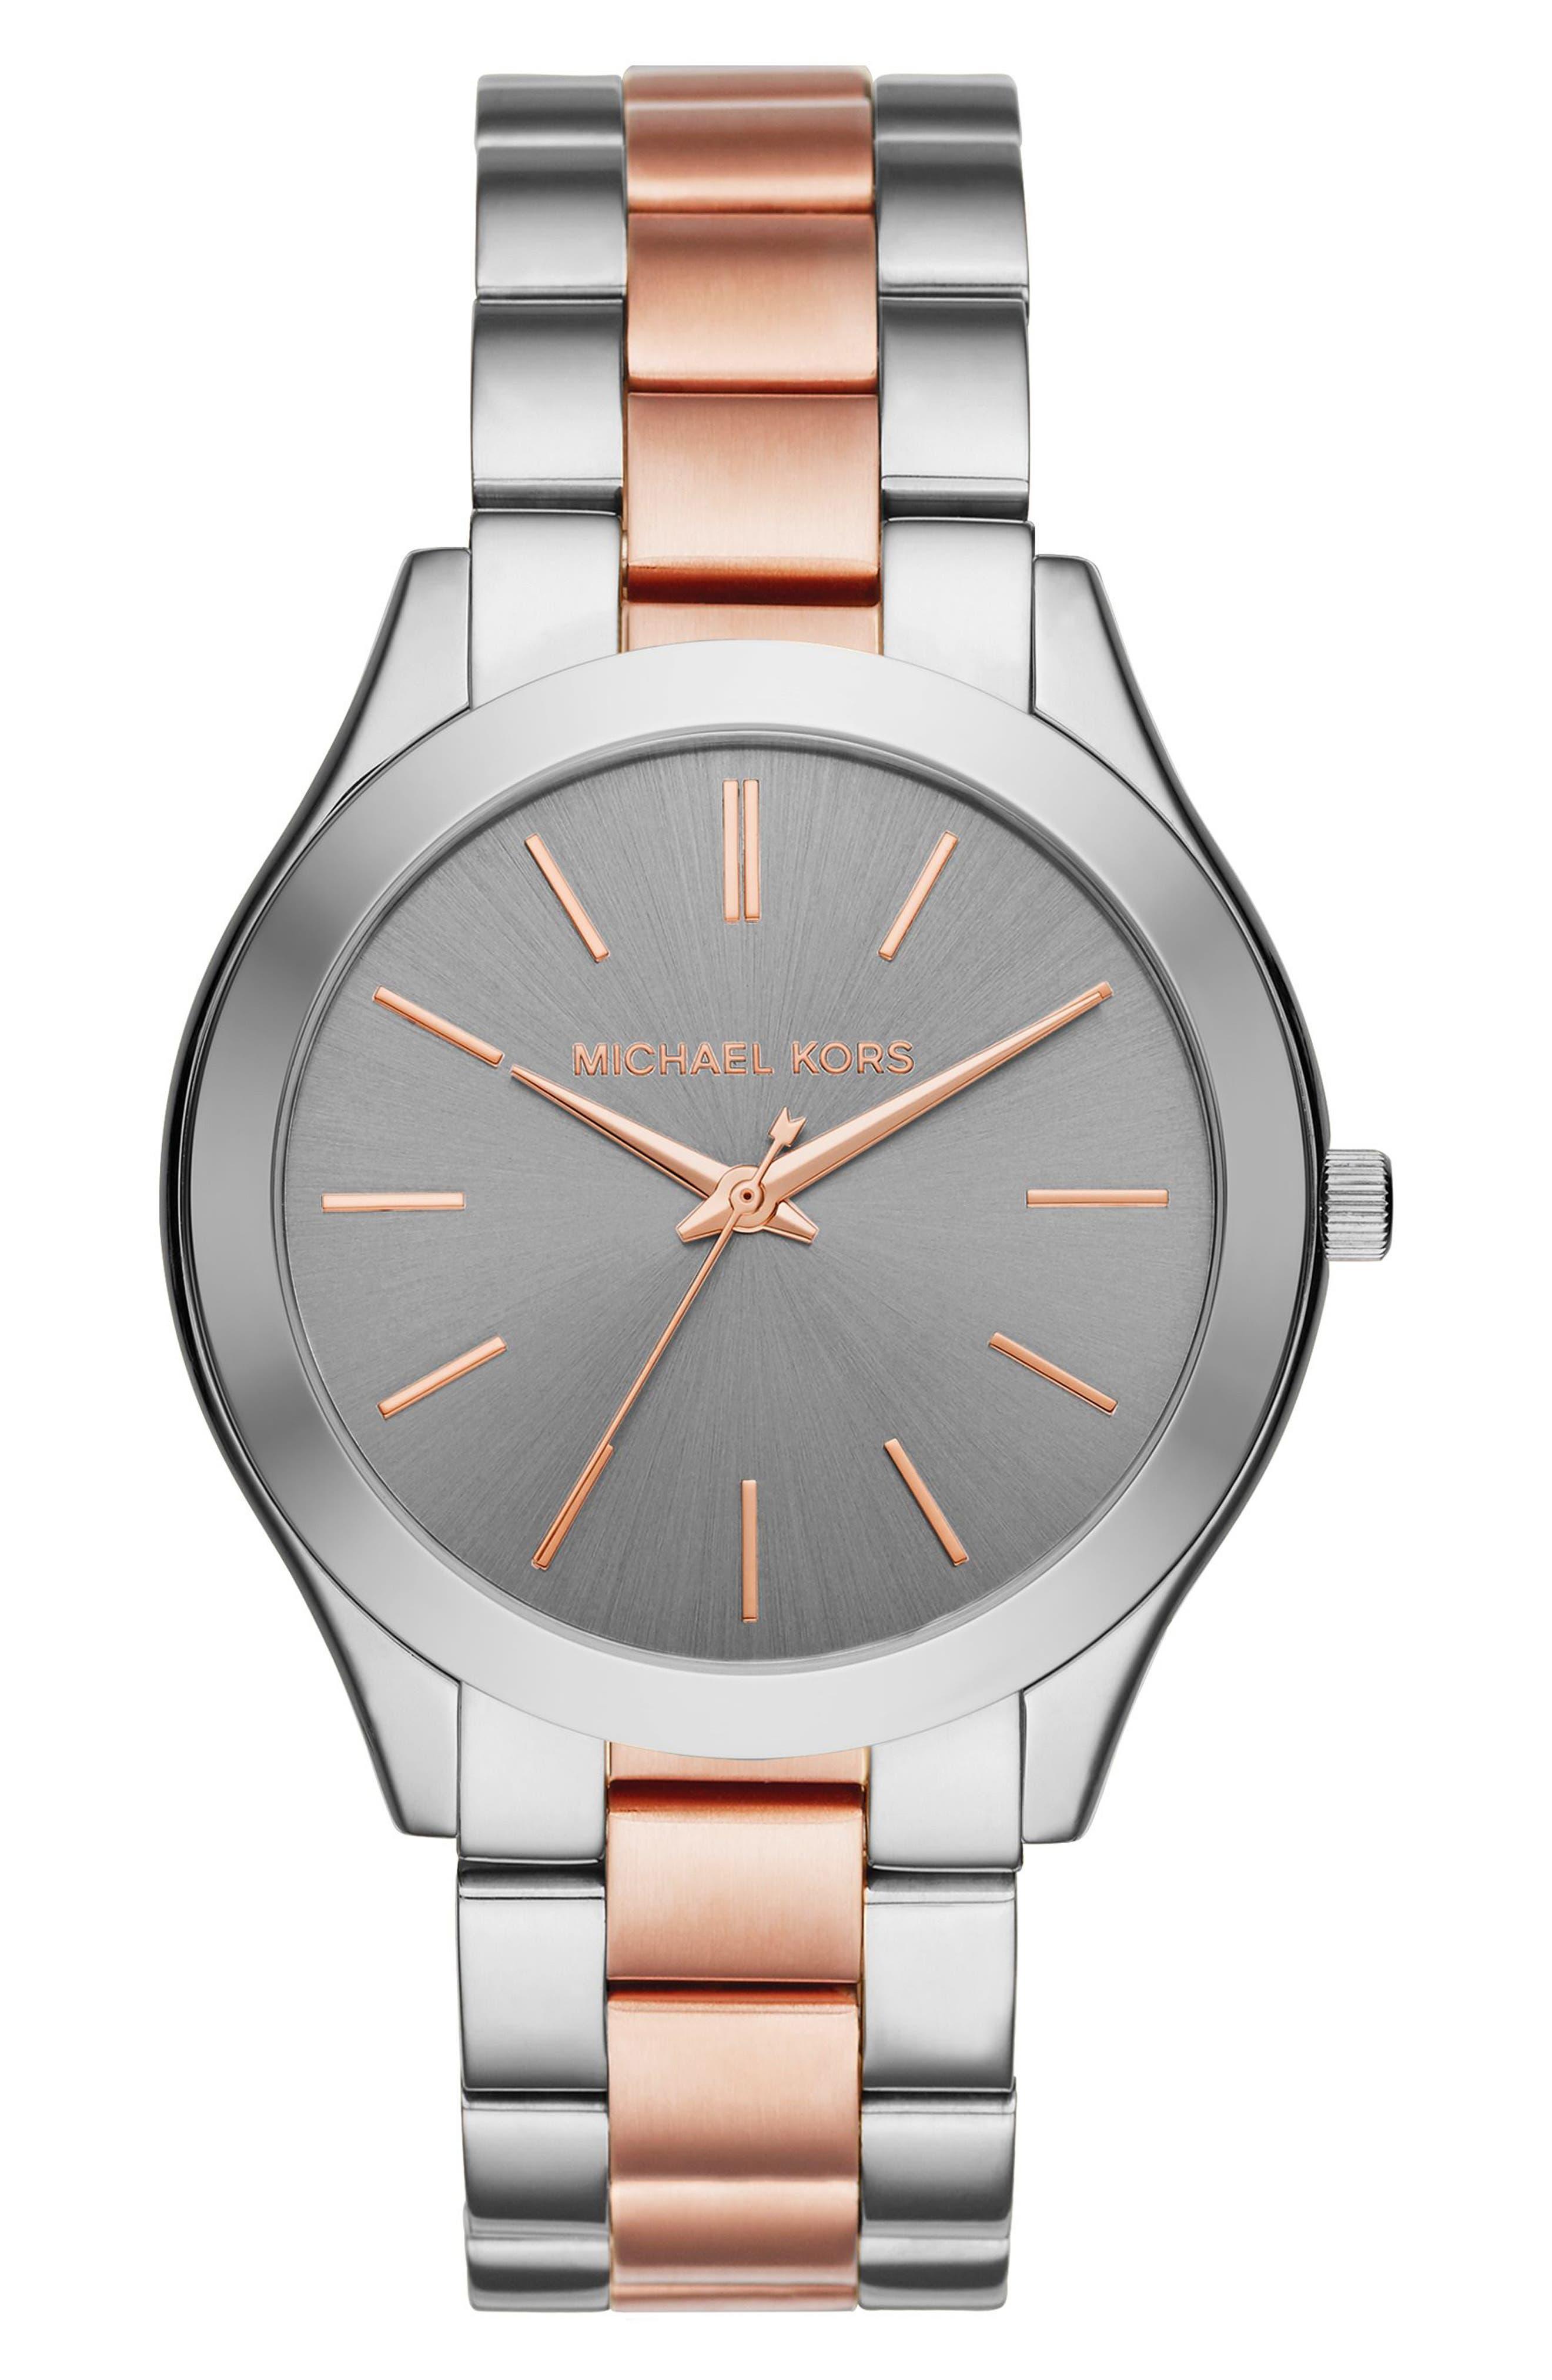 MICHAEL KORS 'Slim Runway' Bracelet Watch, 42mm, Main, color, 049